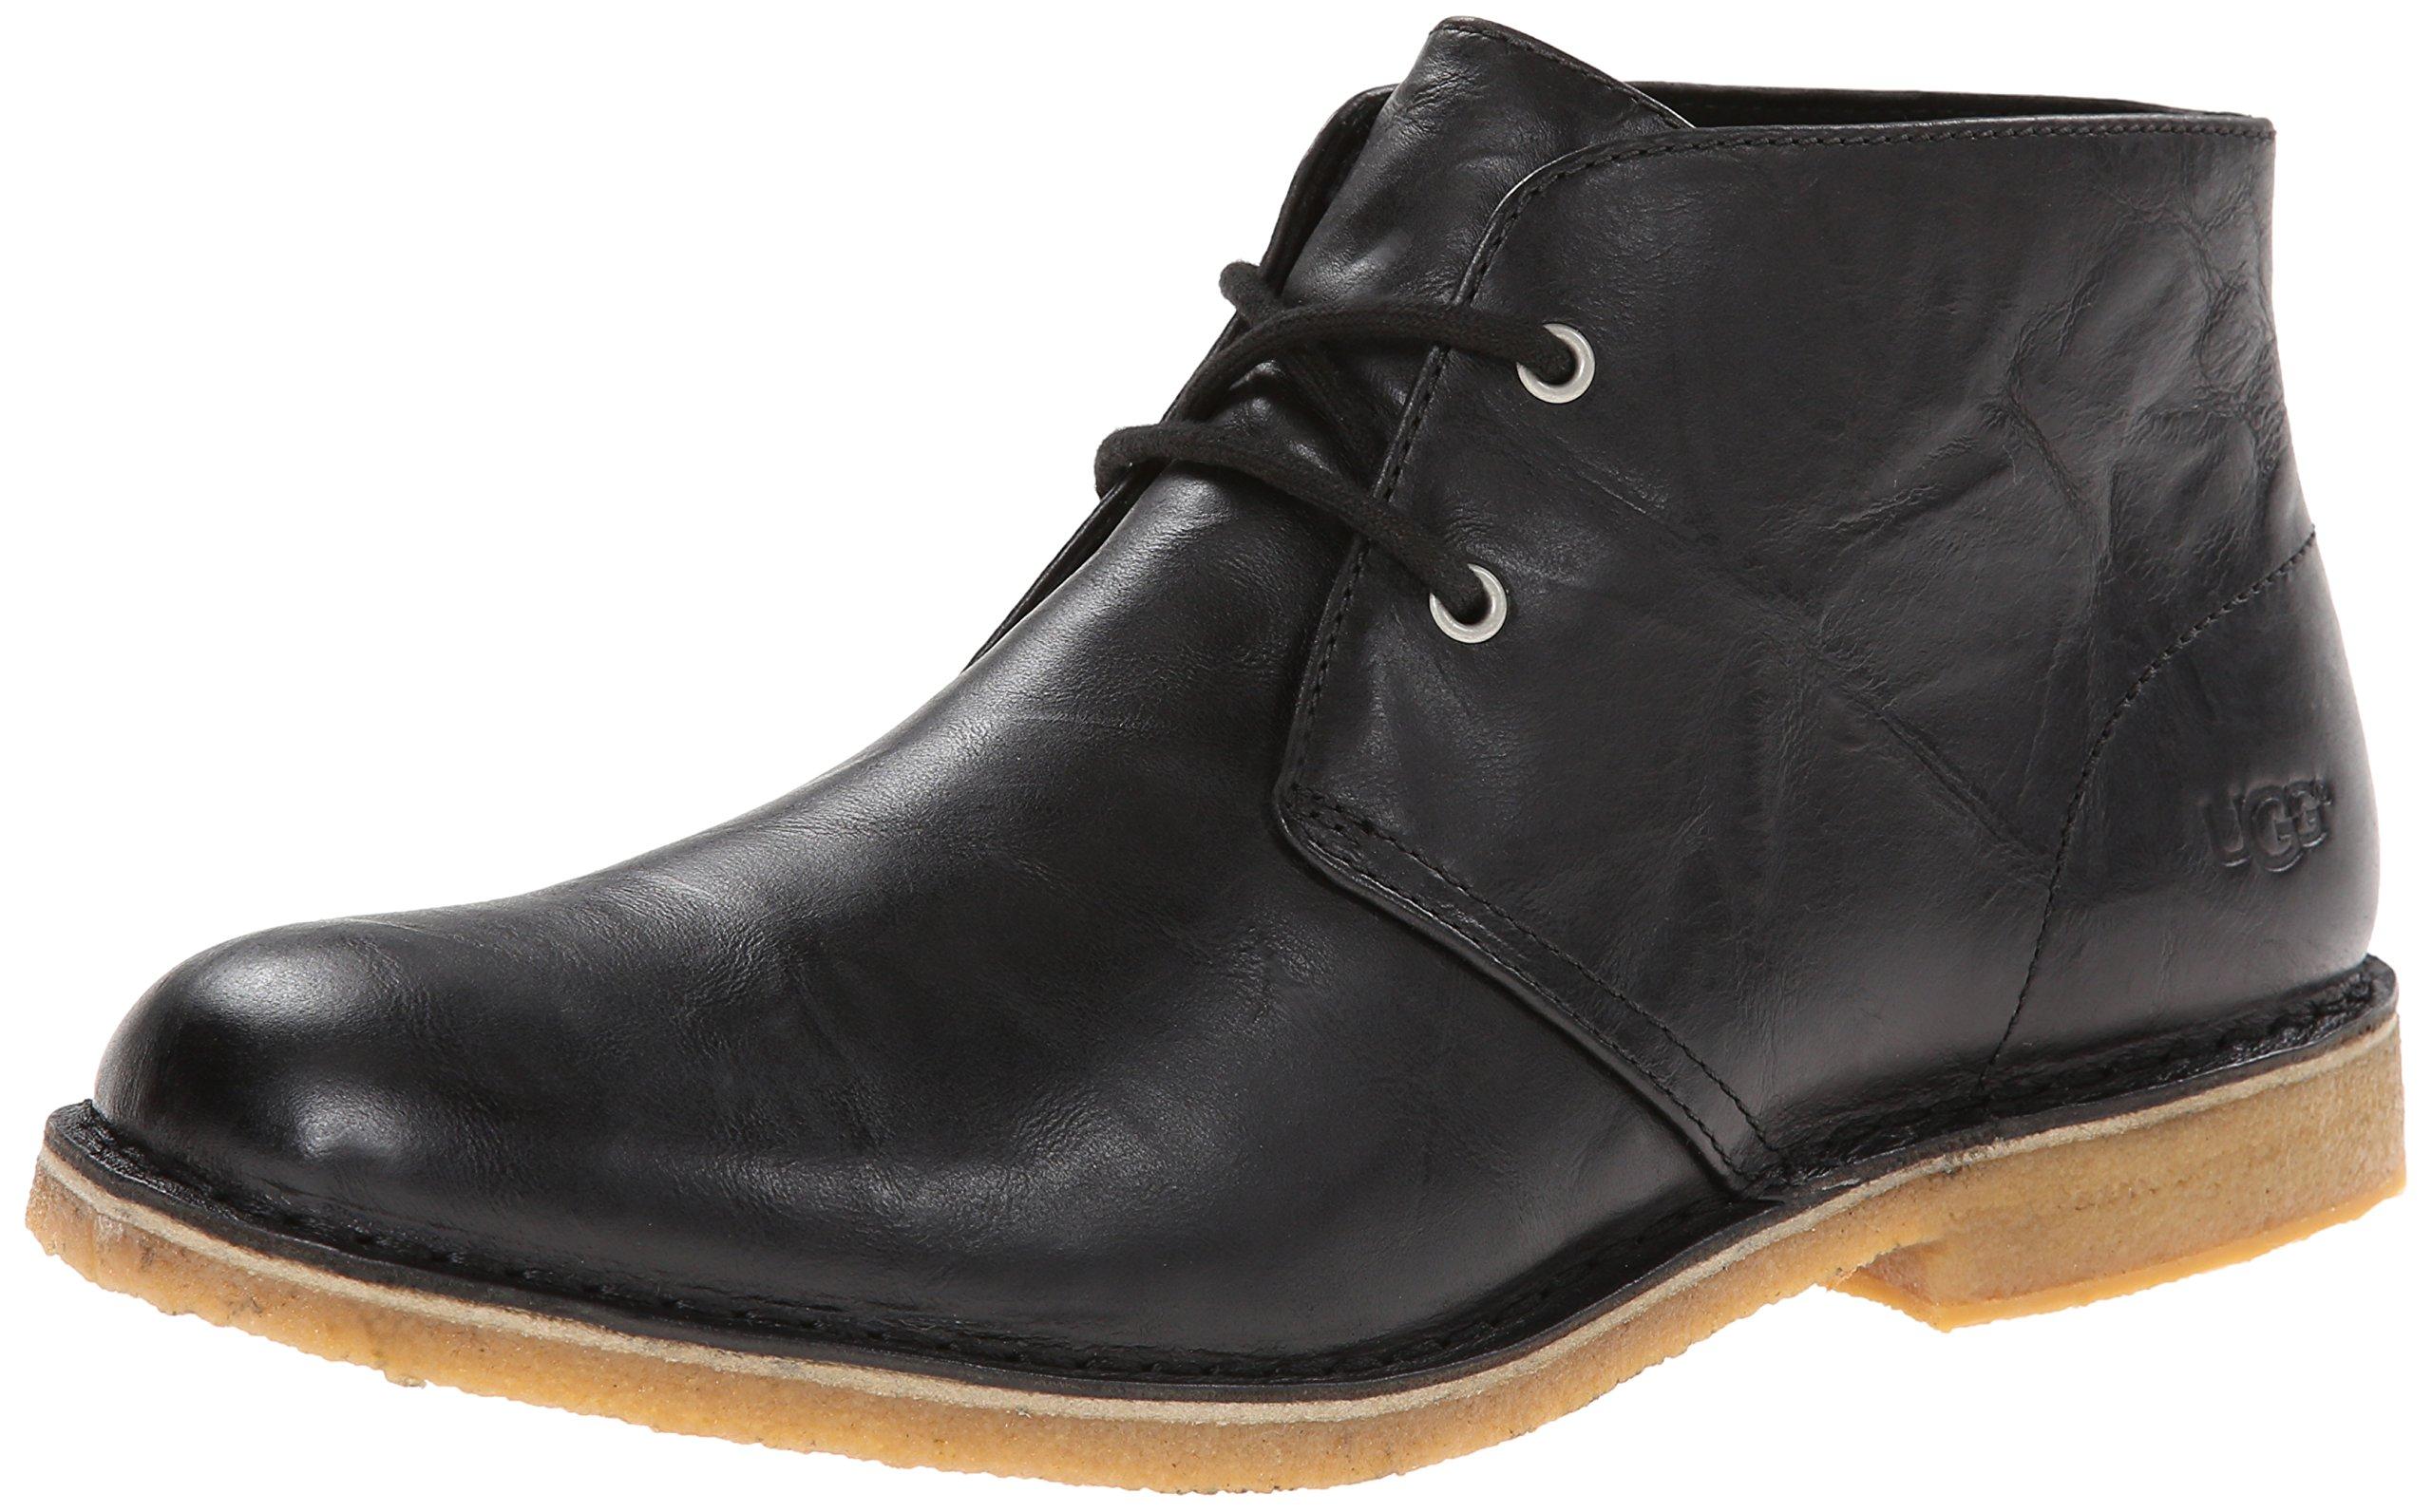 UGG Men's Leighton Chukka Boot, Black, 10.5 M US